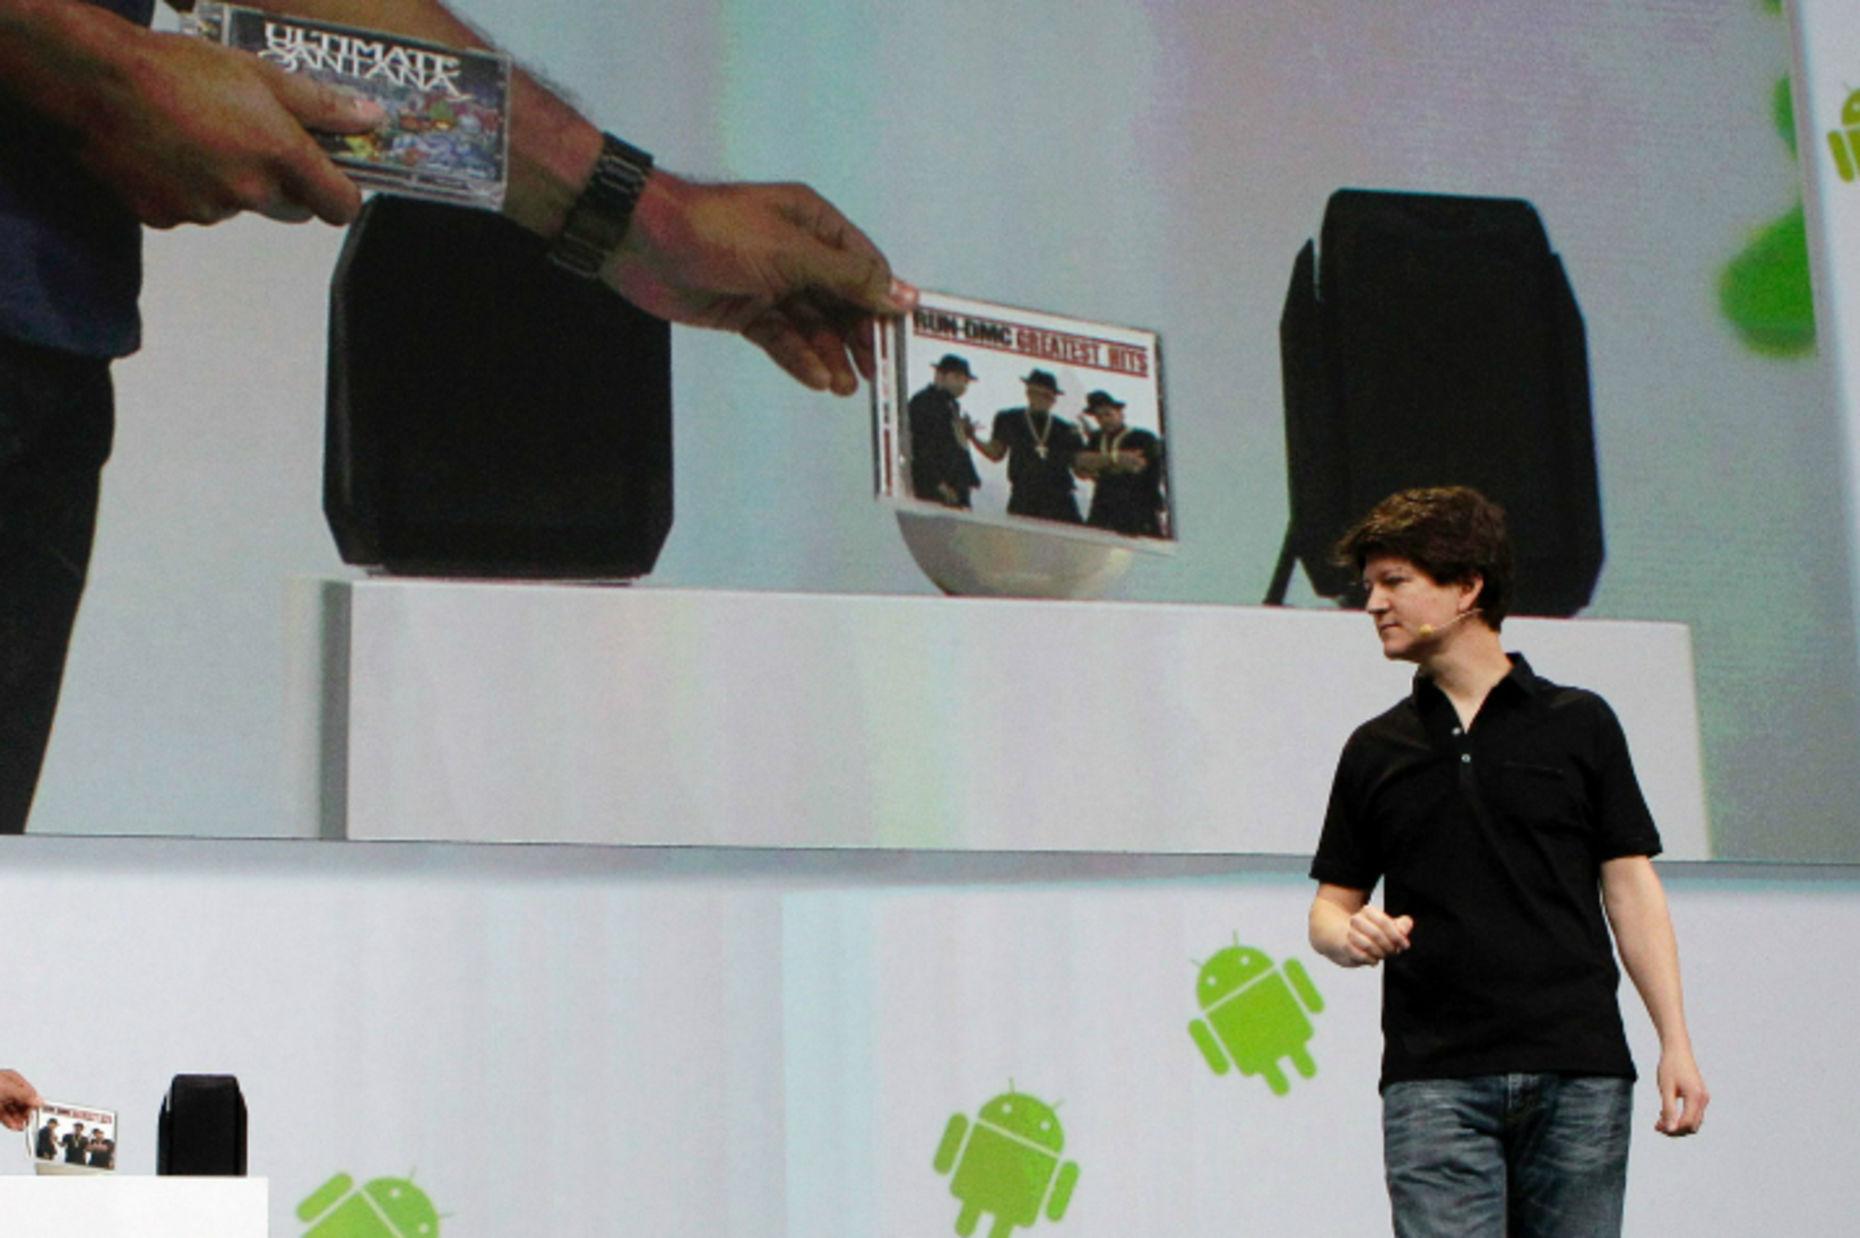 Former Google executive Joe Britt shows a prototype of Nexus Q in 2011. Photo by Associated Press.